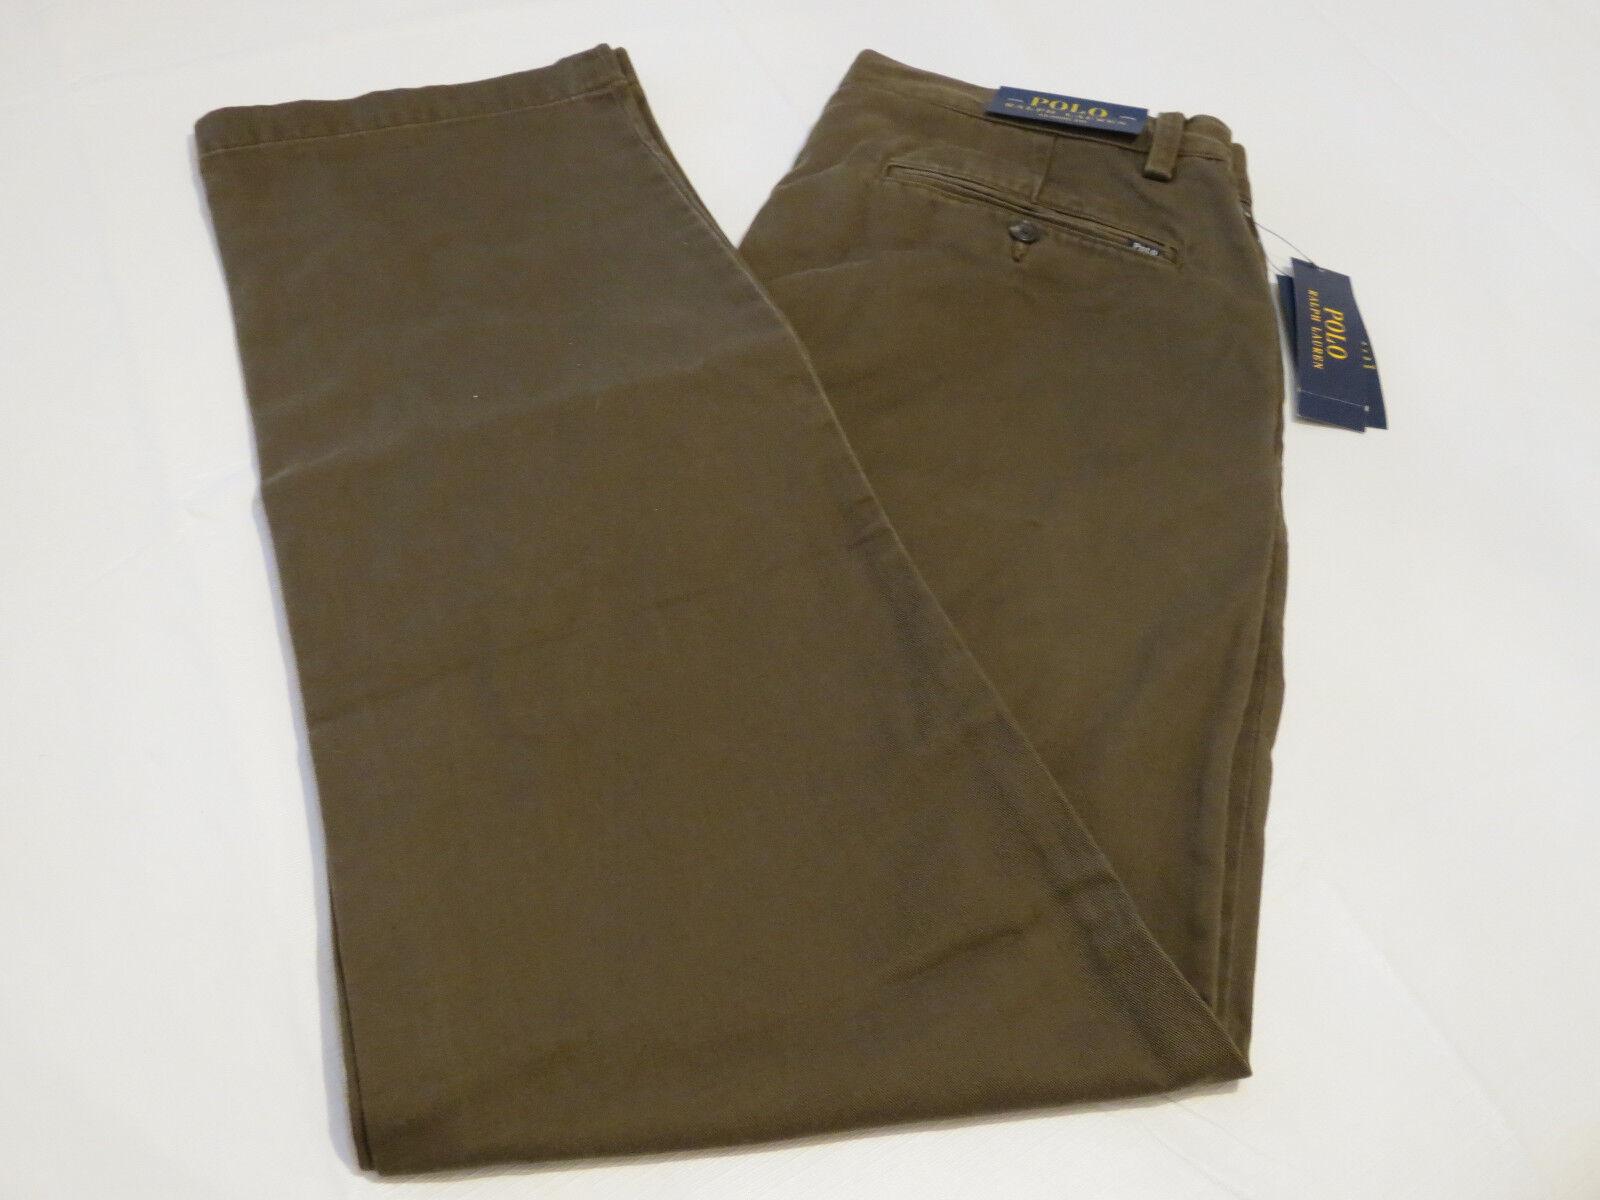 Mens Ralph Lauren Polo pants classics00 34W 30L Classic Fit 4860089 botanc green